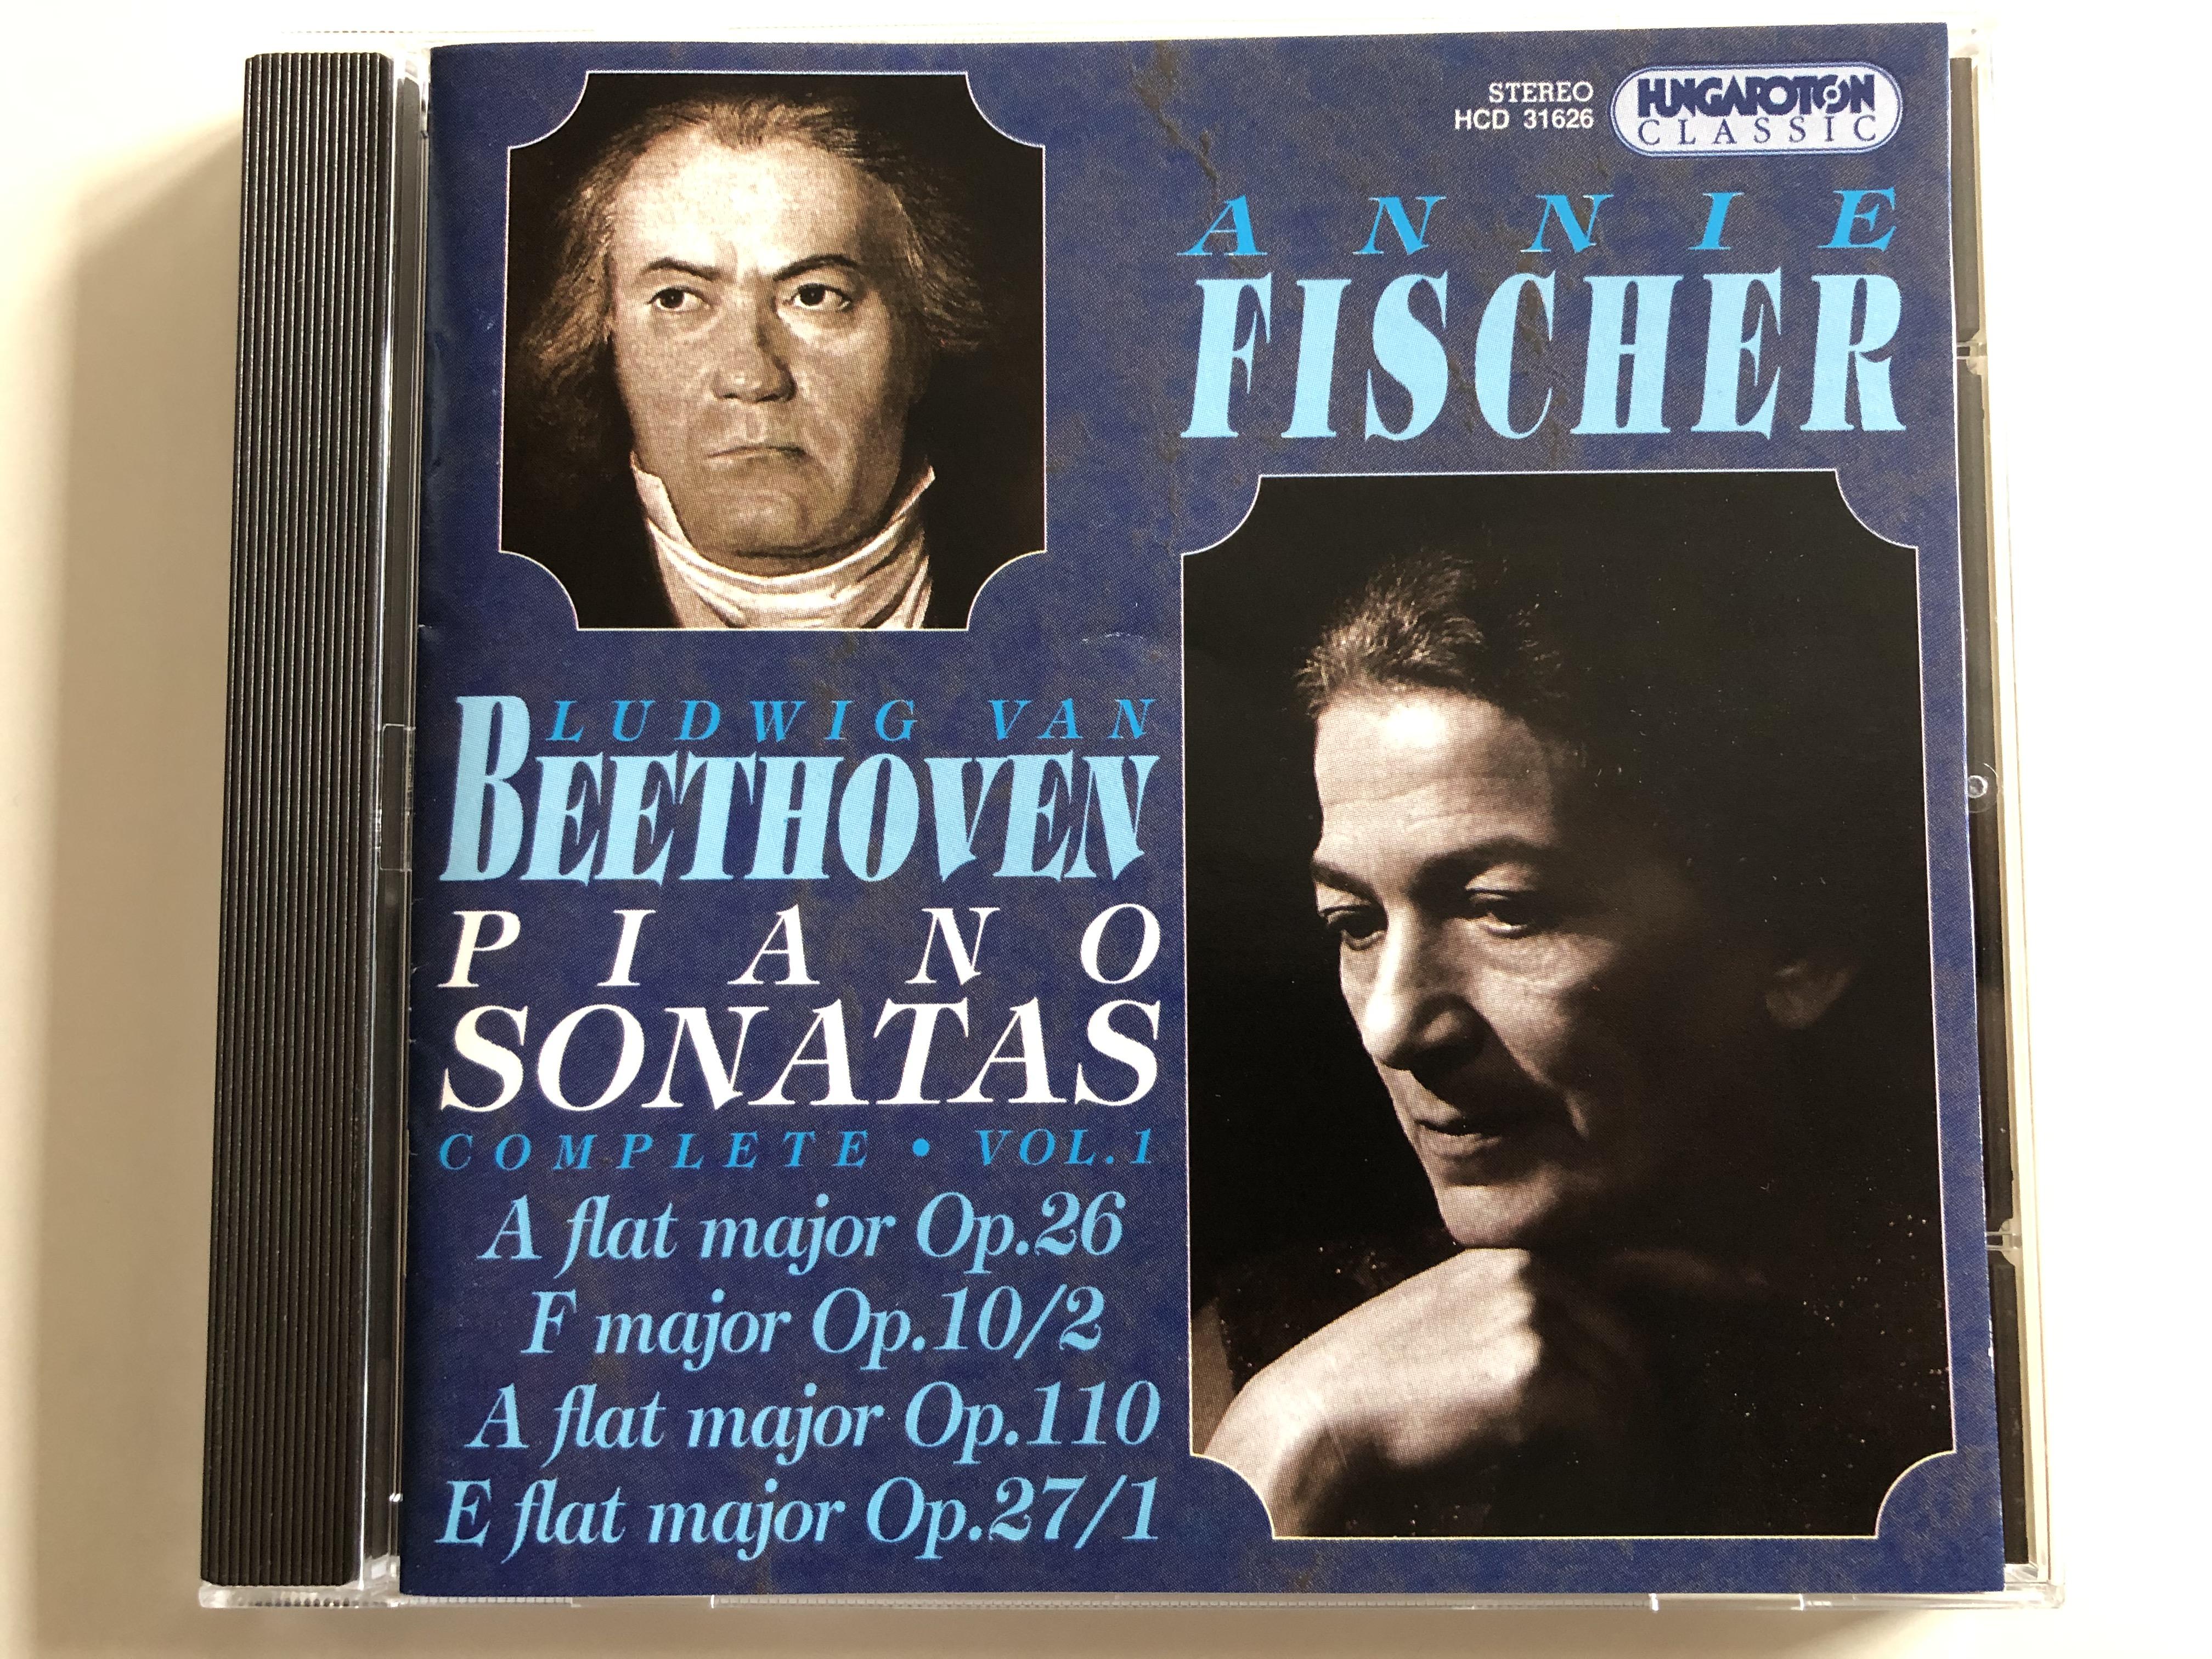 annie-fischer-ludwig-van-beethoven-piano-sonatas-complete-vol.-1-a-flat-major-op.-26-f-major-op.-102-a-flat-major-op.-110-e-flat-major-op.271-hungaroton-classic-audio-cd-1996-stereo-1-.jpg